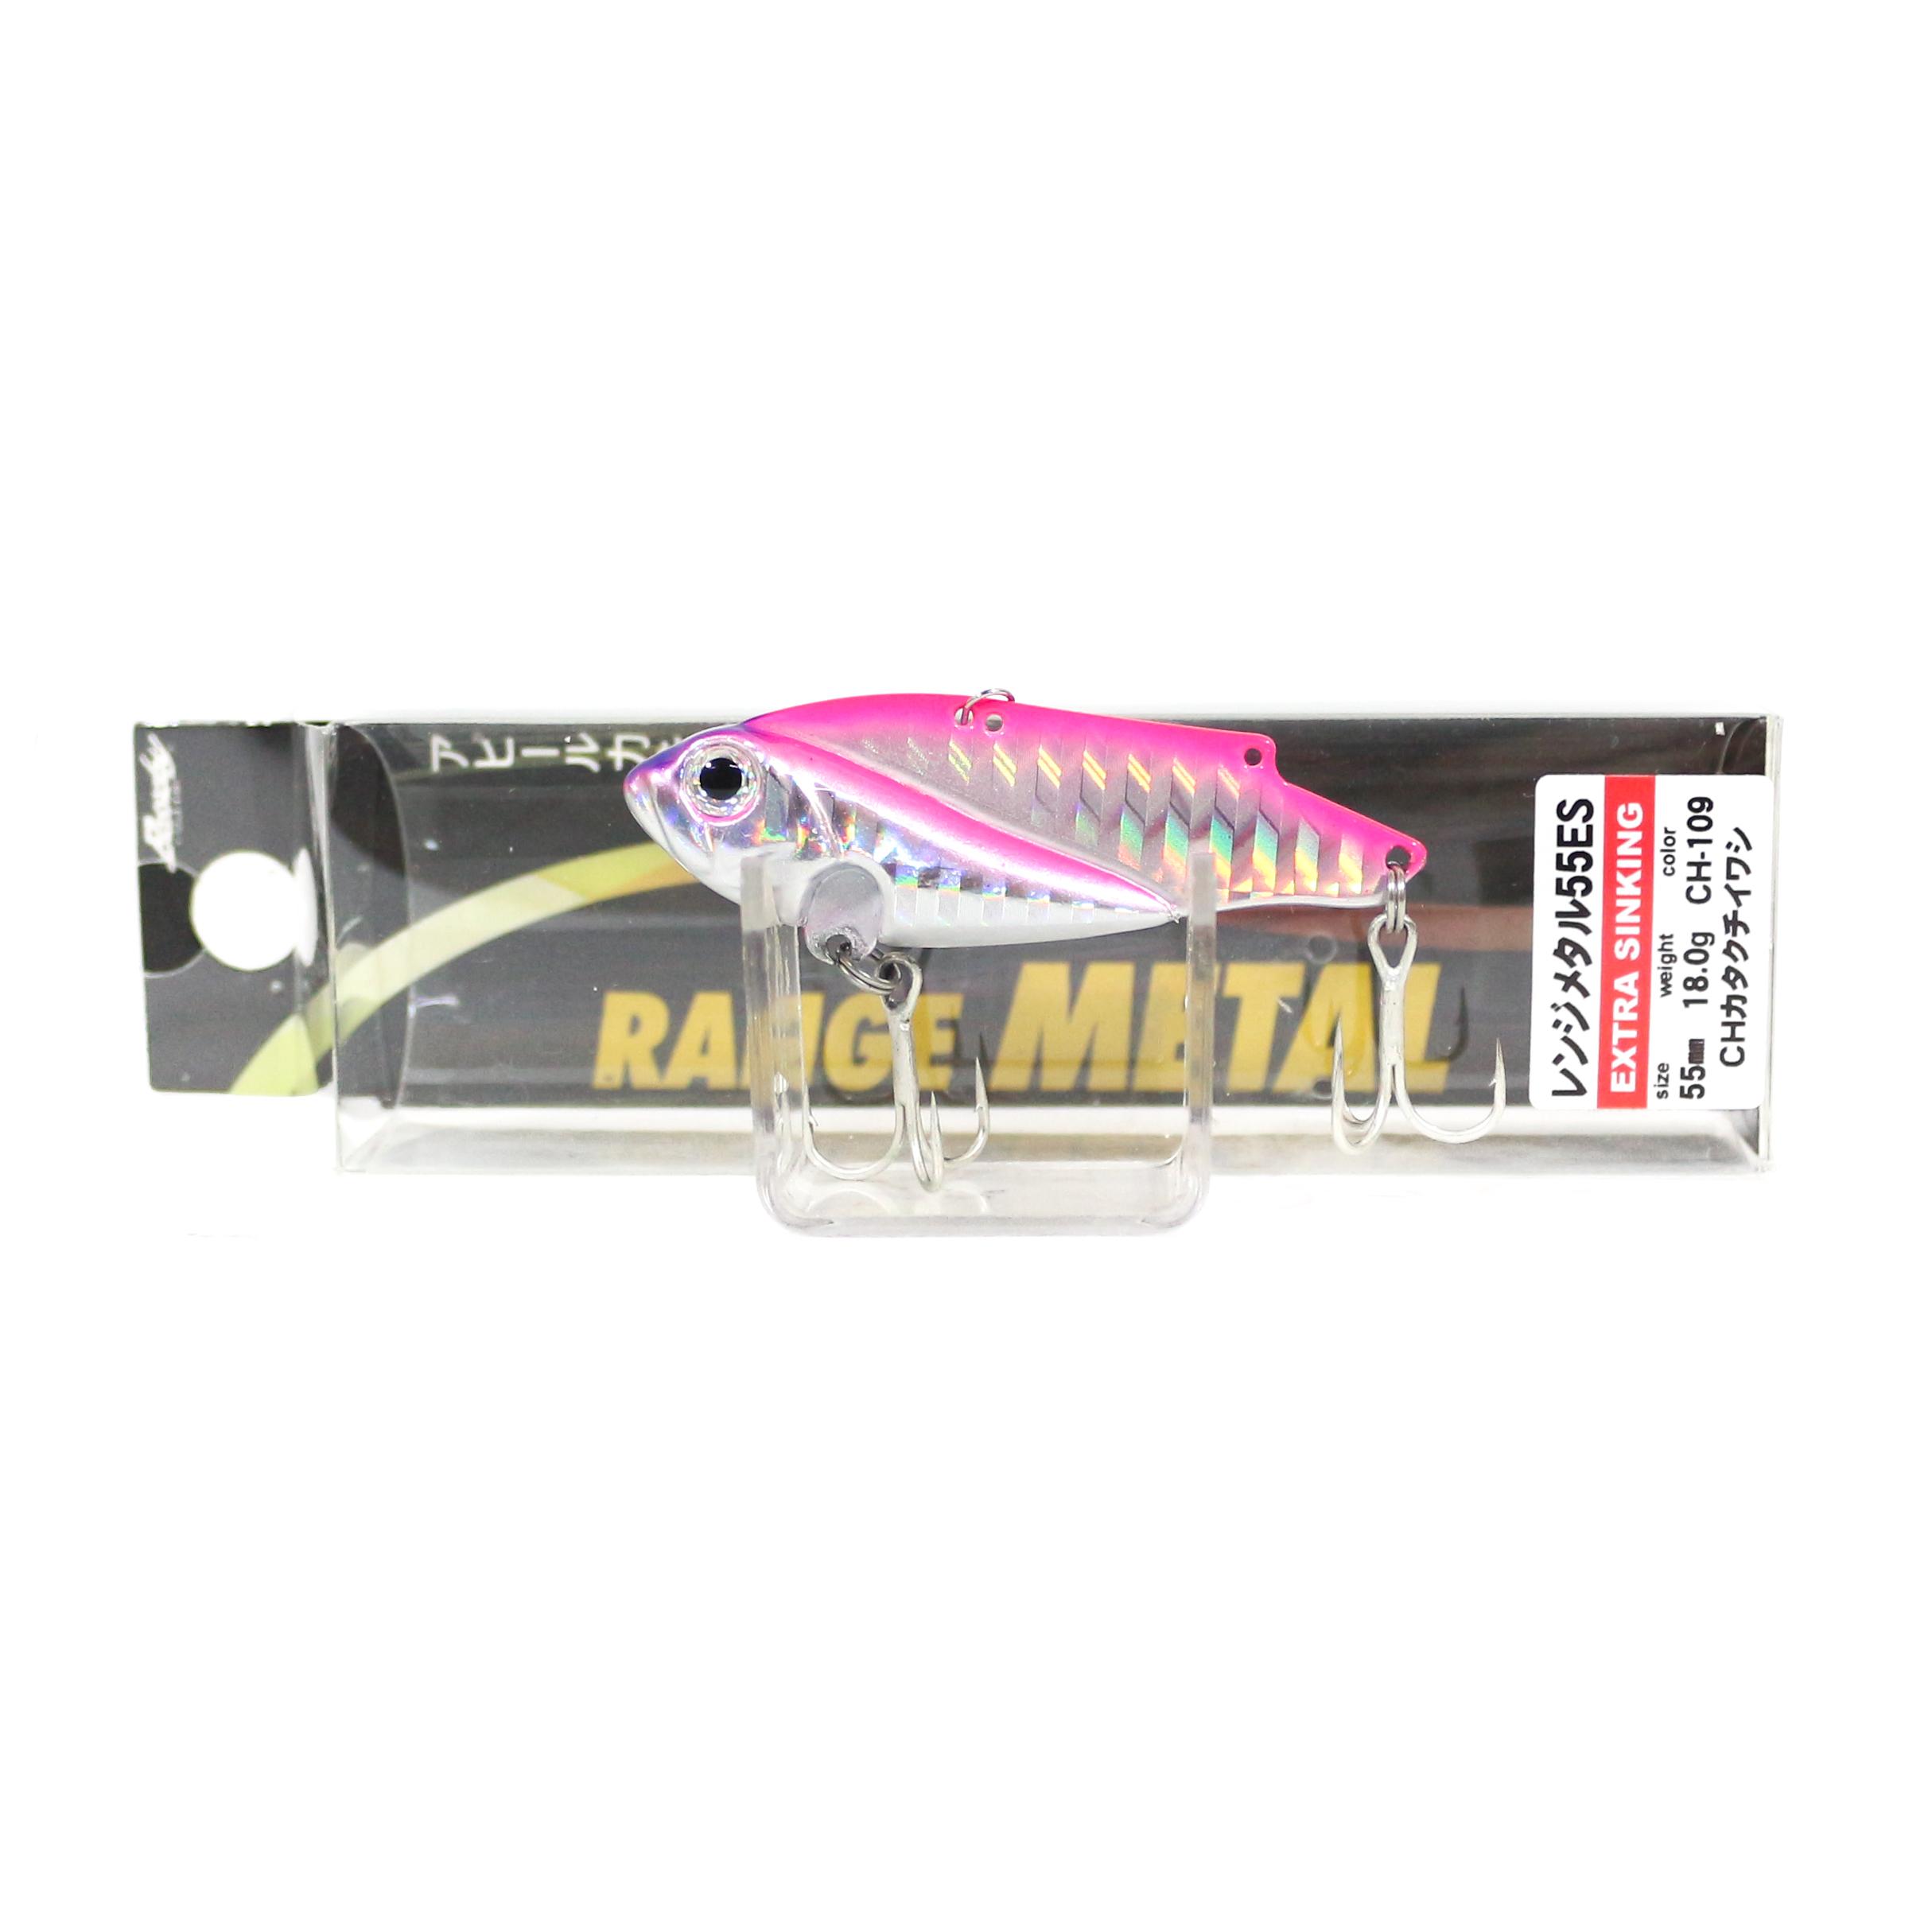 Bassday Range Metal 55 ES Extra Sinking Vibration Lure HH-02 (1144)